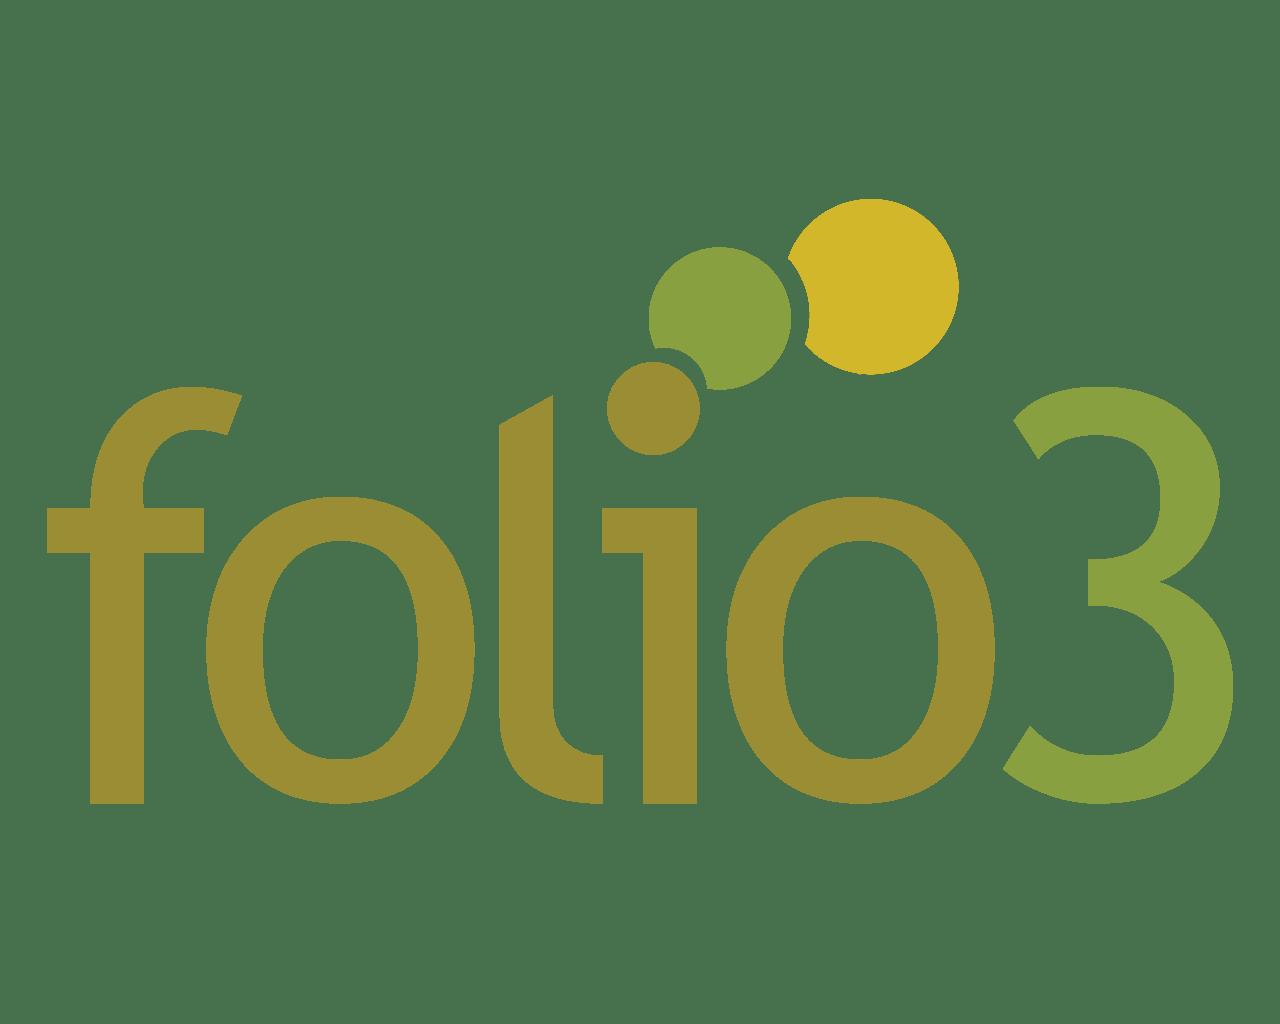 Logo: Folio3